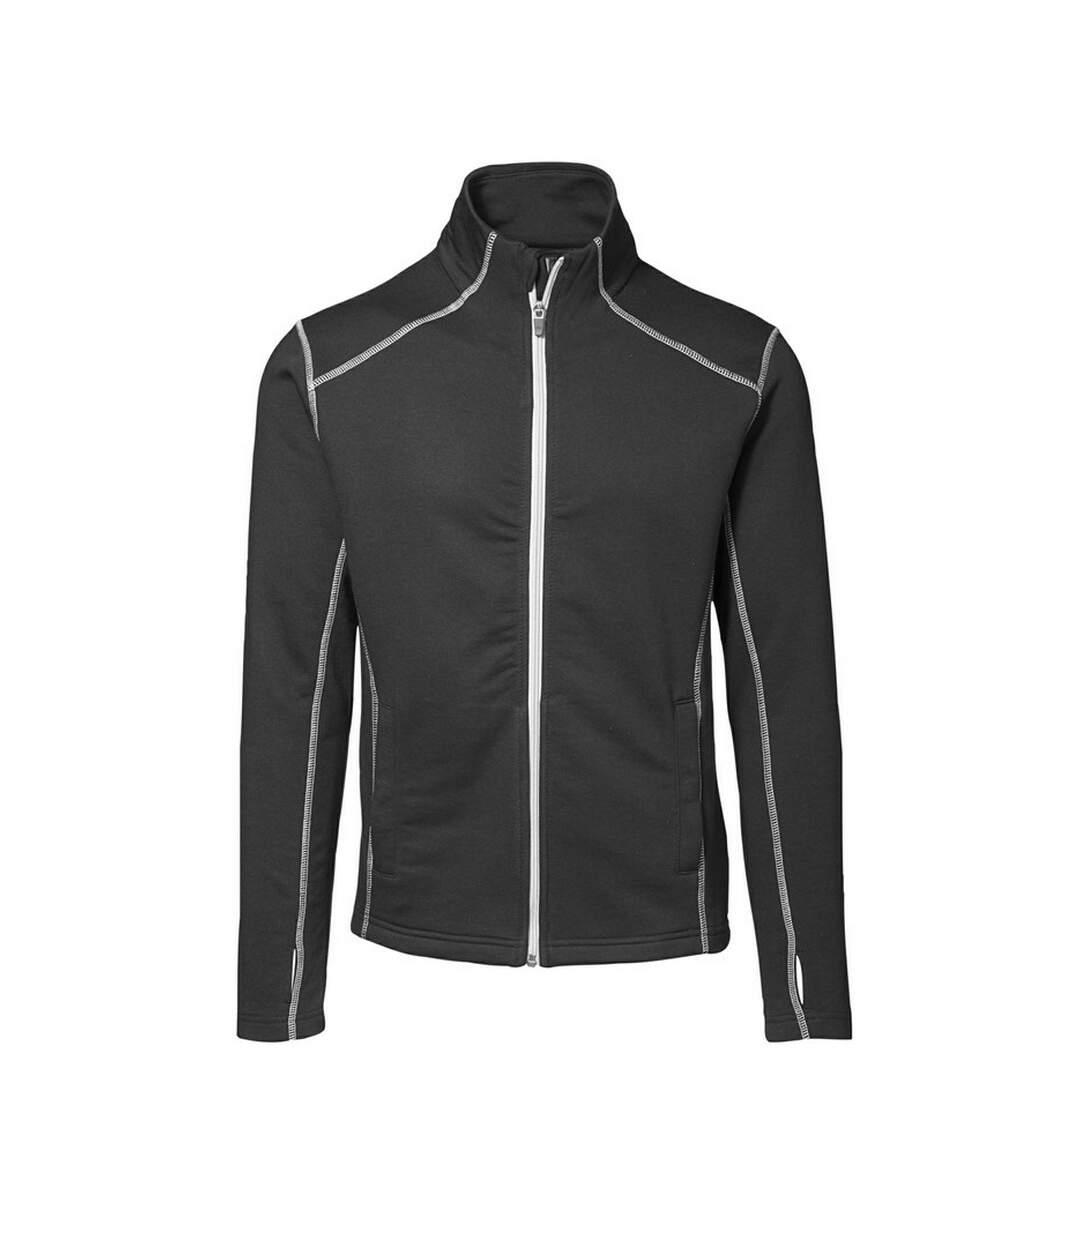 ID Mens Full Zip Fitted Sweatshirt With Contrast Trim (Black) - UTID237